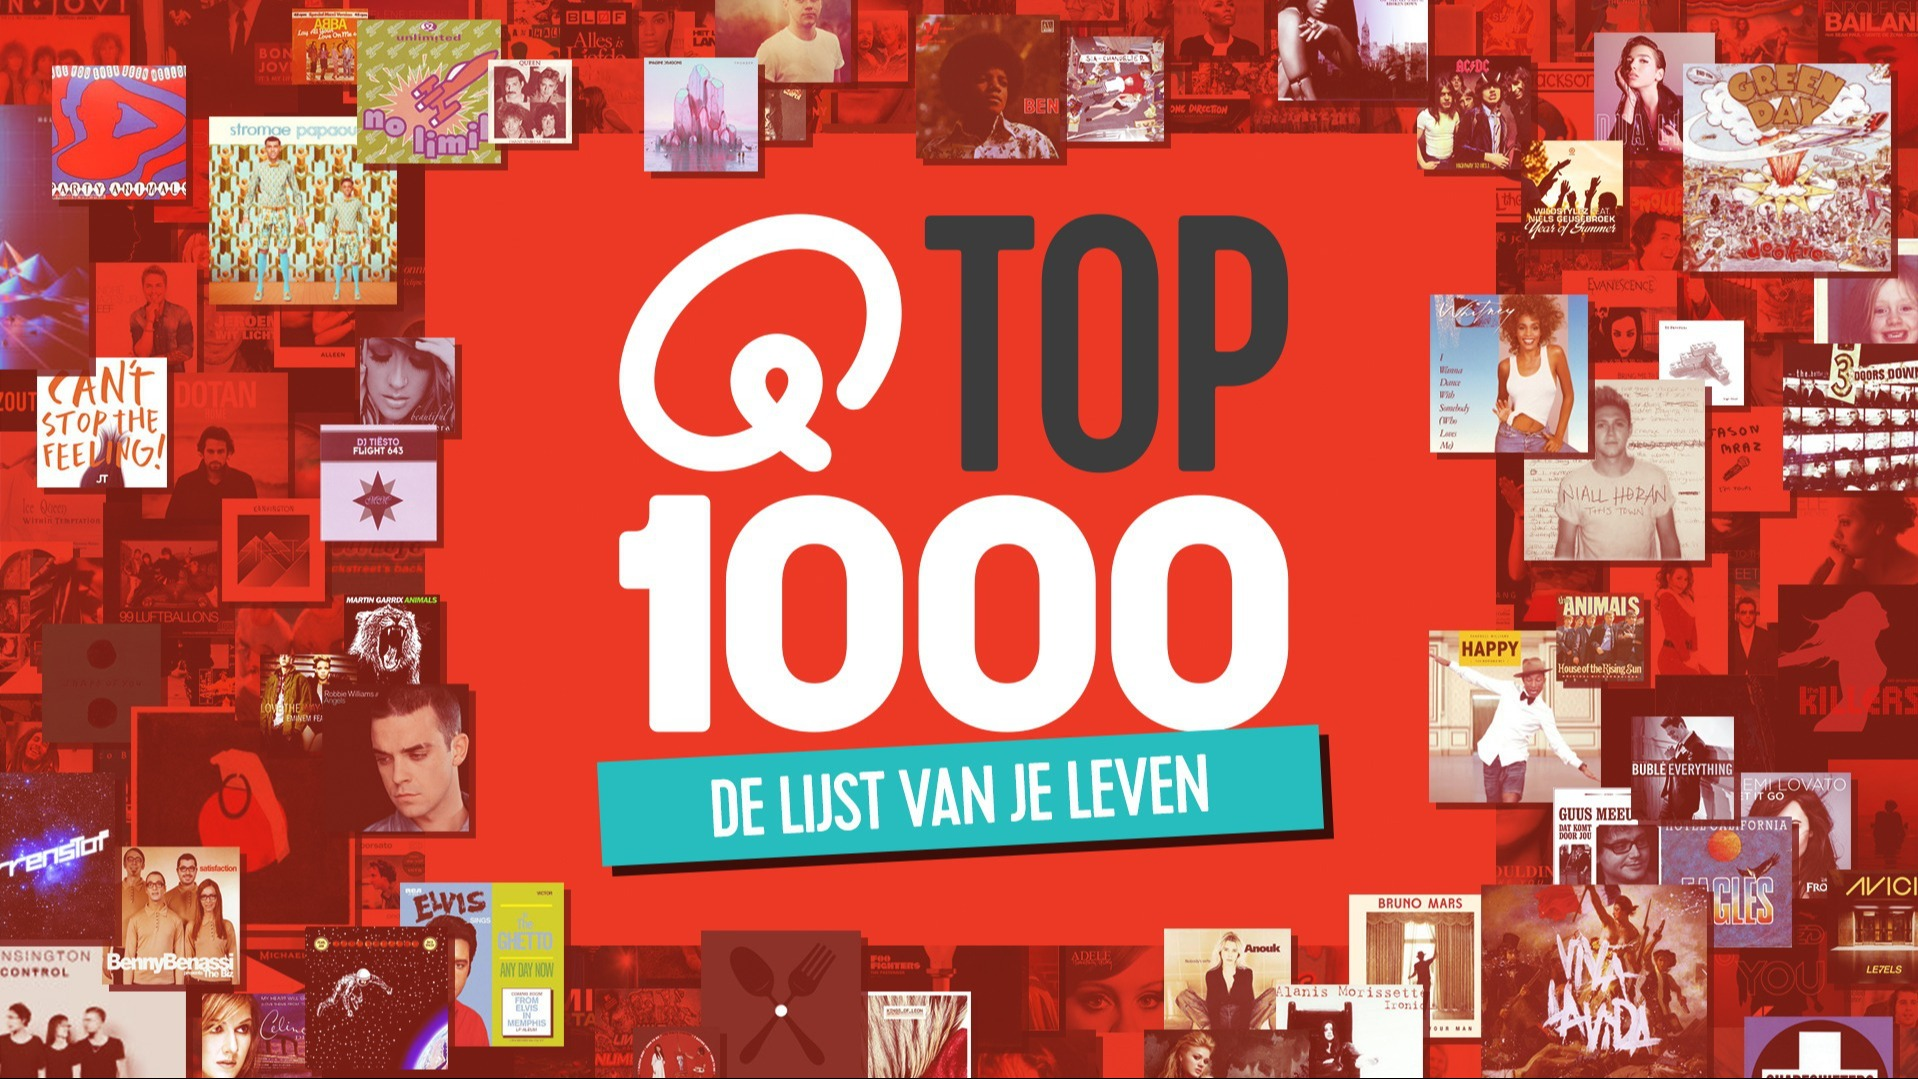 Actiepagina top1000 1920x1080 2020 v01